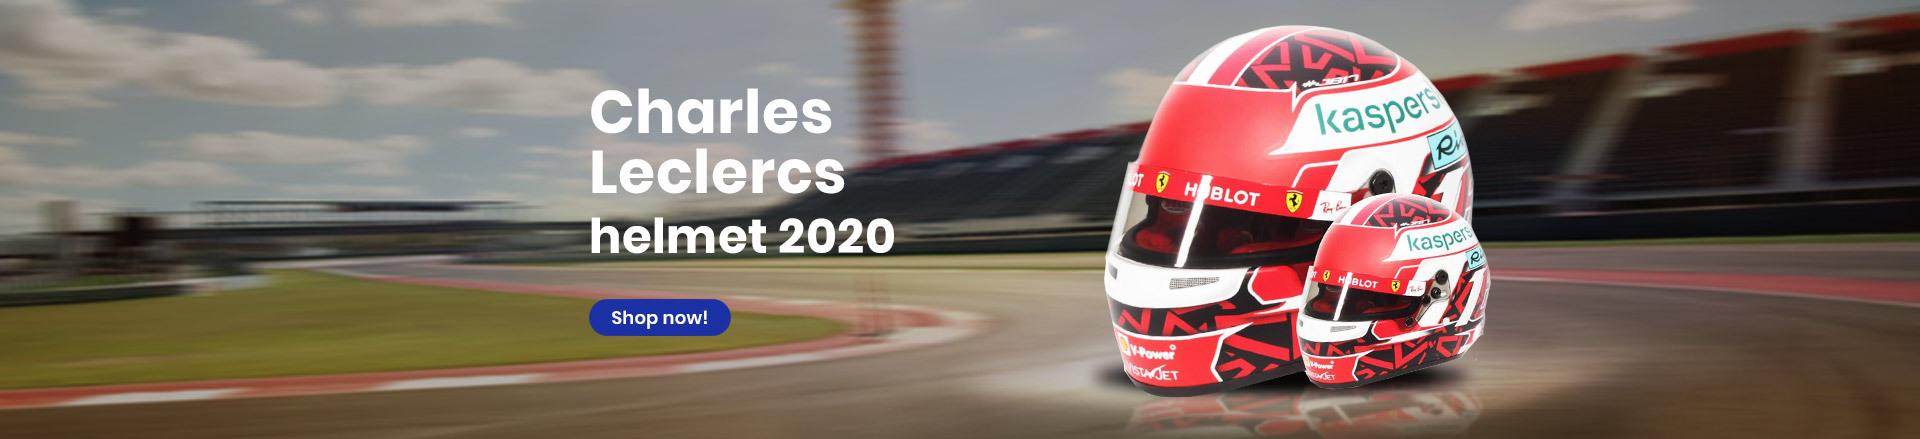 Charles Leclercs helmet 2020